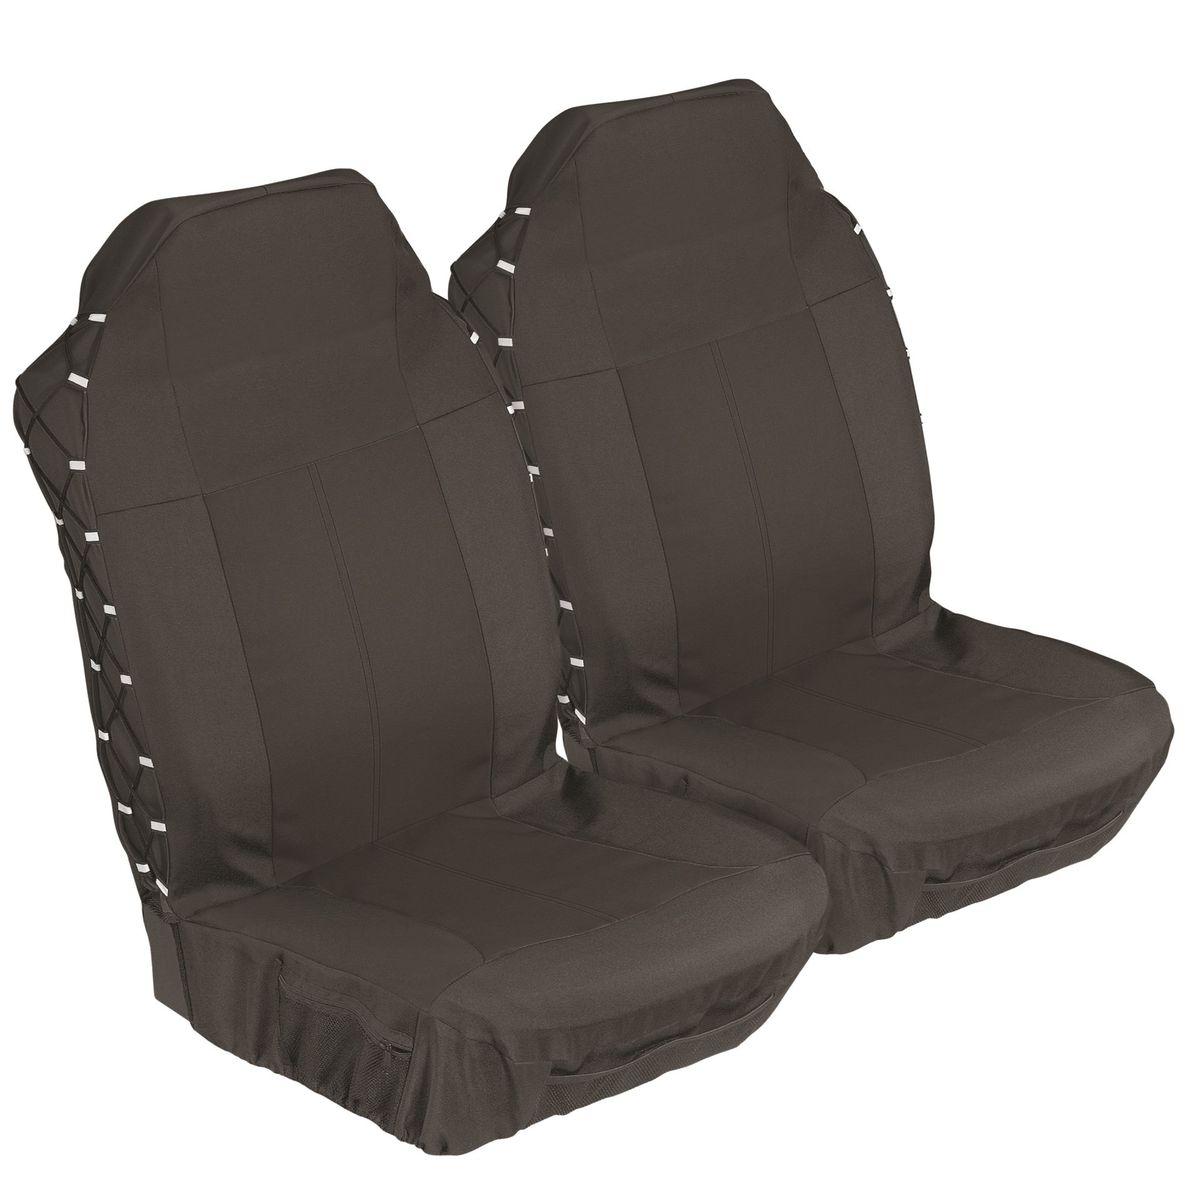 Stingray - Explorer Front Seat Cover Set - Black | Buy Online in ...